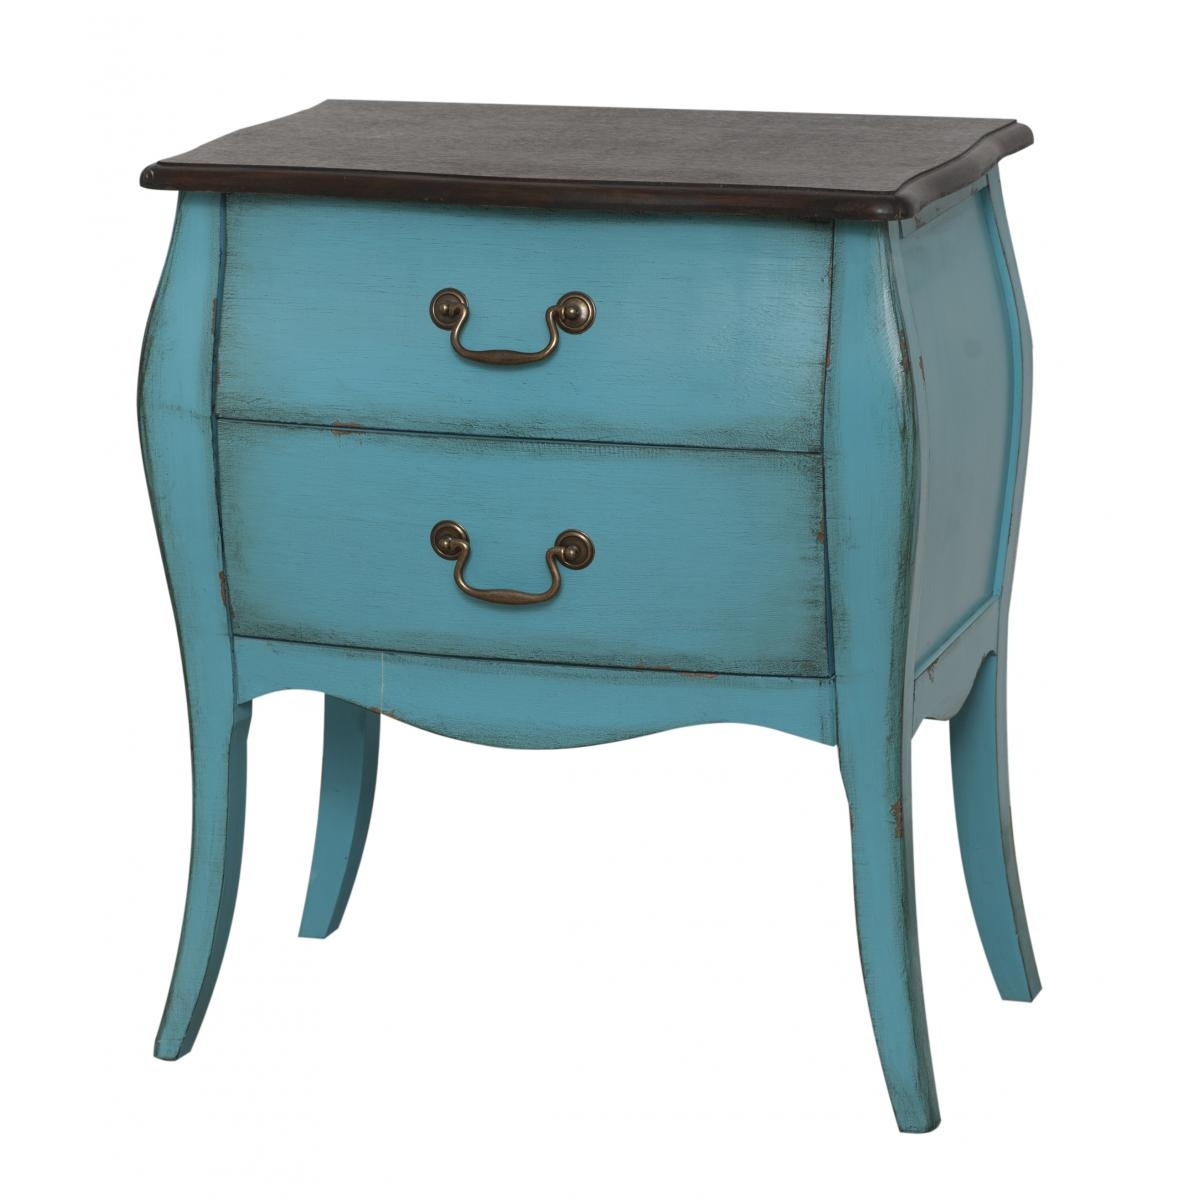 Cabinet din lemn de plop furni si MDF cu 2 sertare Mellow Low Turquoise / Brown l62xA38xH72 cm